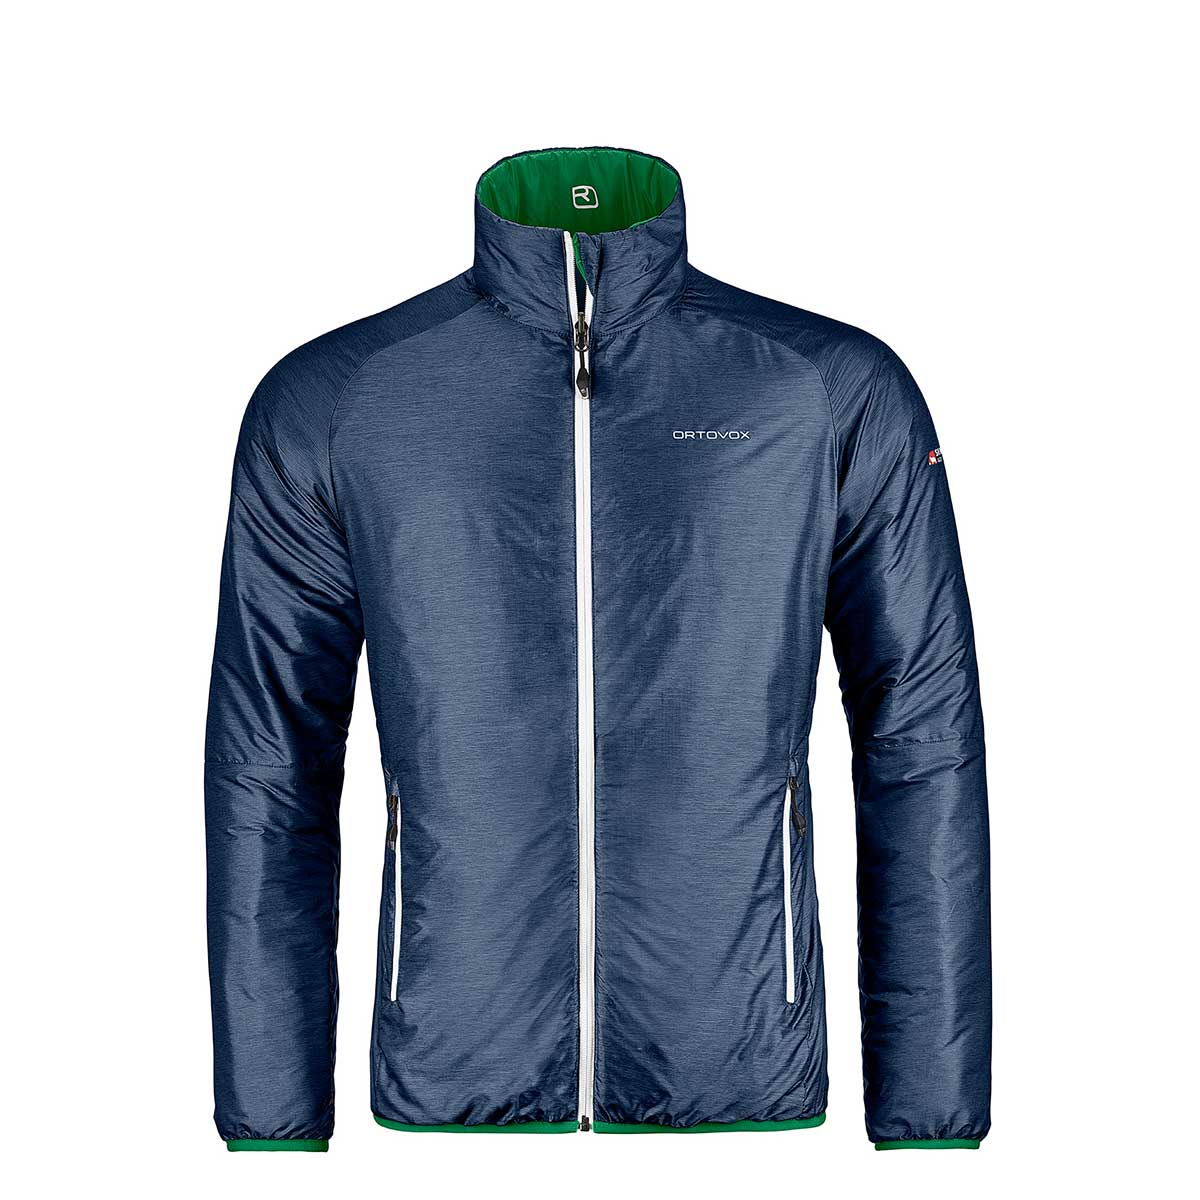 32da91cd9 Ortovox Swisswool Piz Boval Jacket night blue 17/18 - Softshell & Isolation